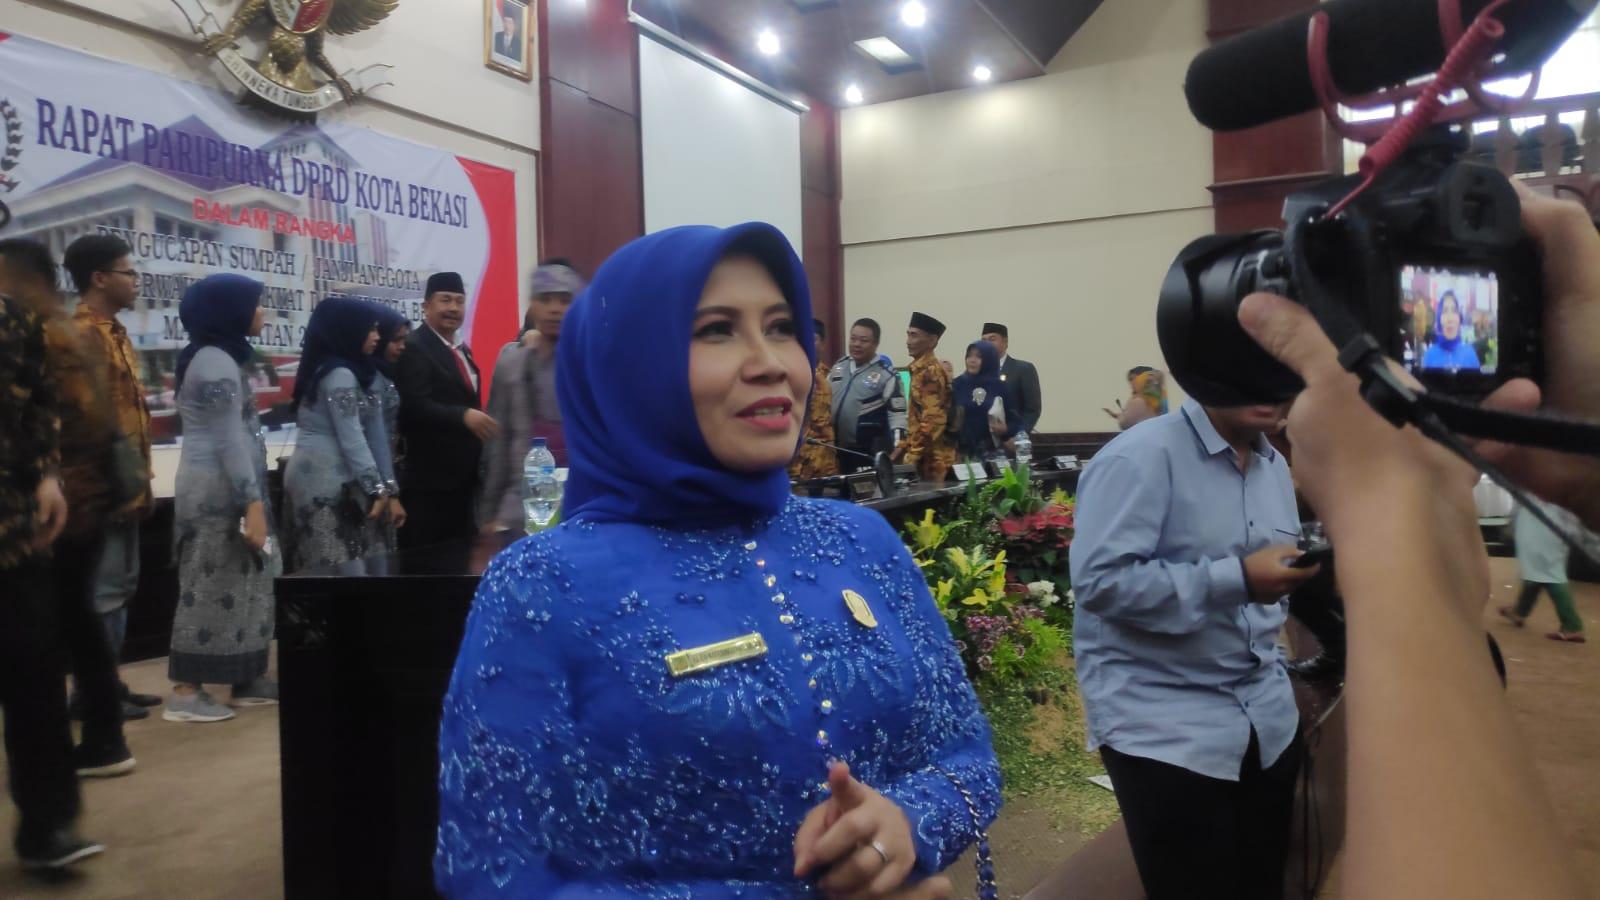 Perlu Kajian Khusus Terkait Wacana Kota Bekasi Gabung ke Jakarta